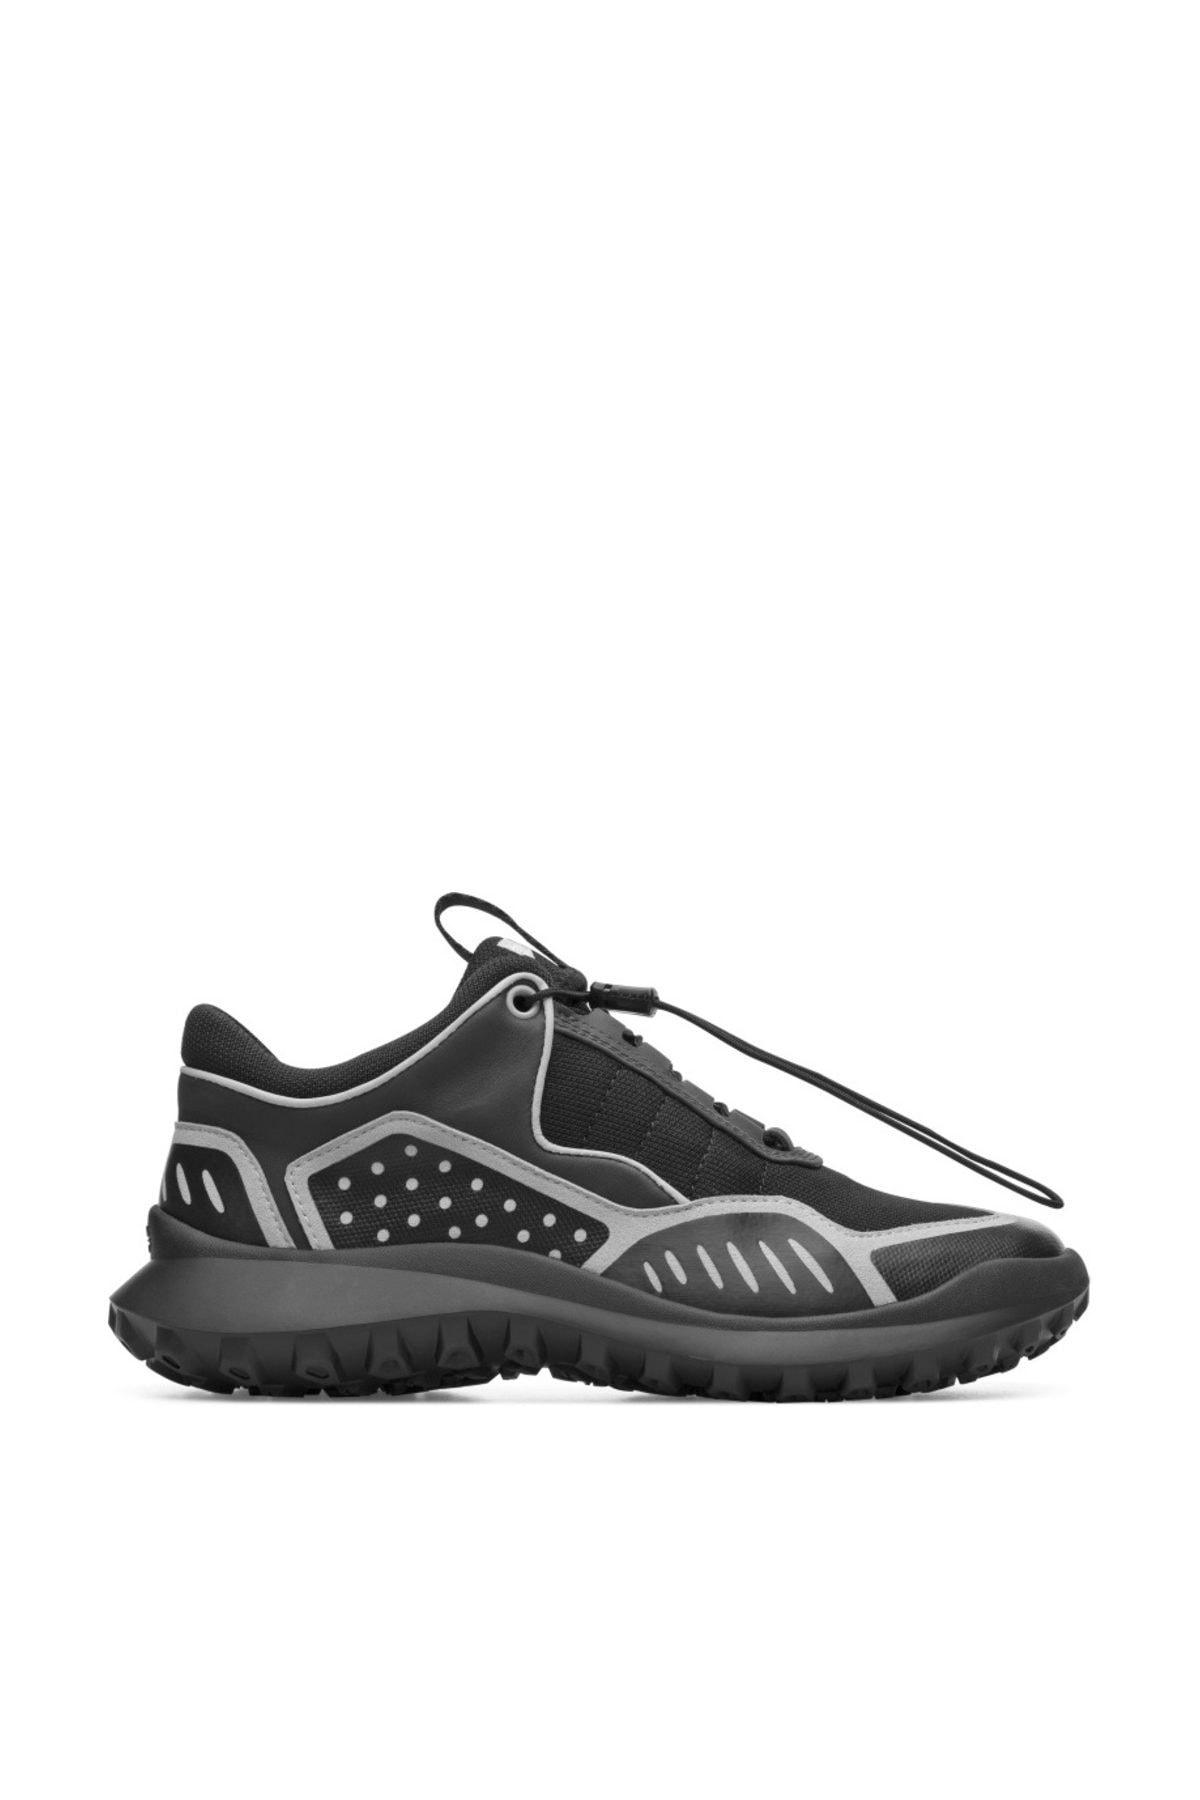 CAMPER Kadın Crclr Sneaker K200886-004 1